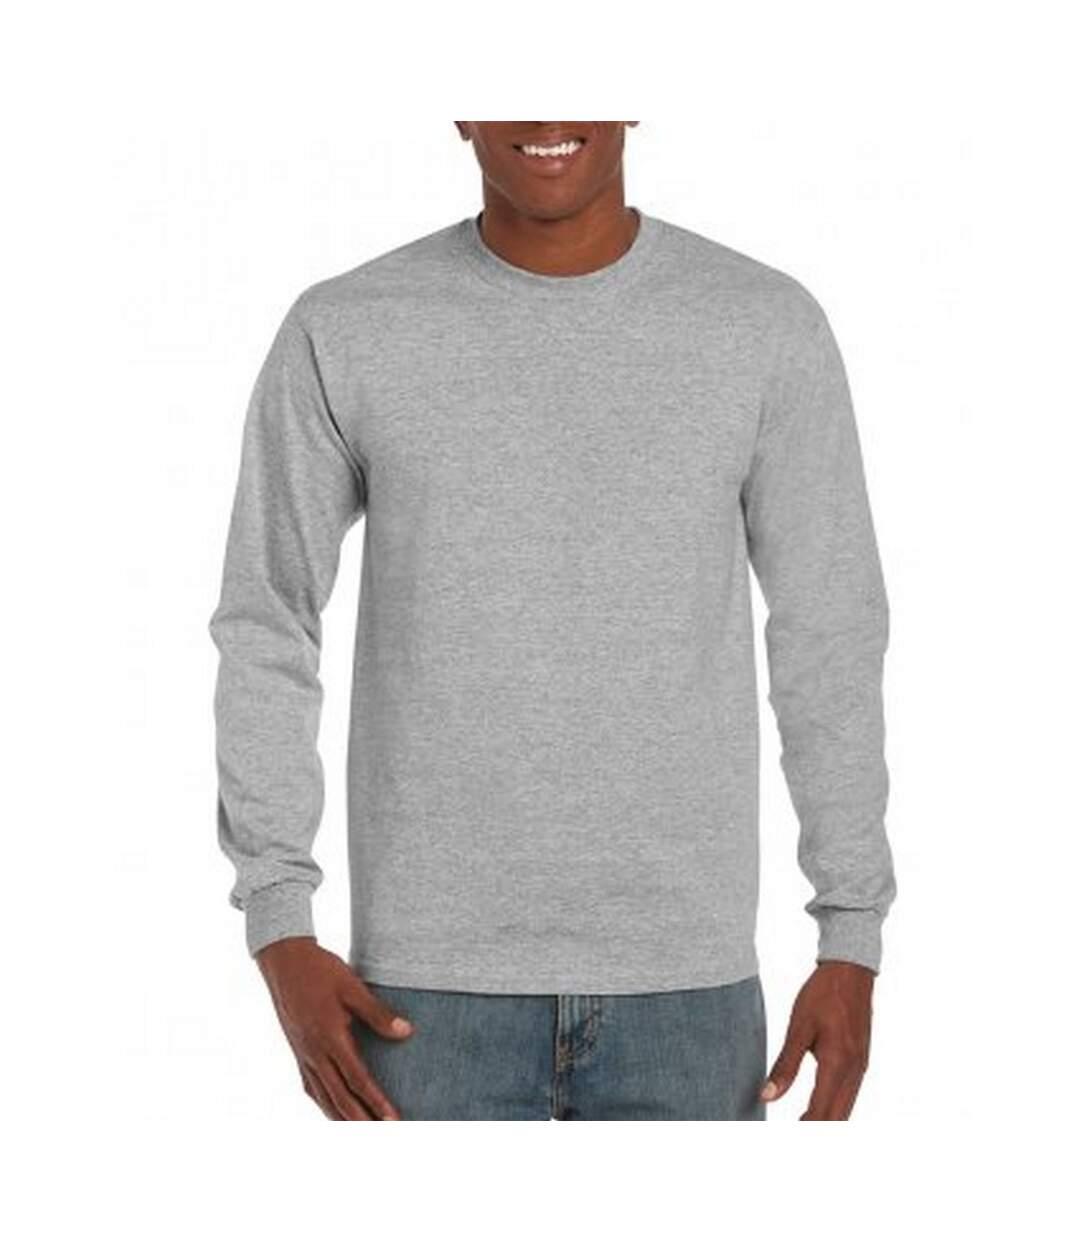 Gildan Mens Hammer Heavyweight Long Sleeve T-Shirt (Sport Grey) - UTPC3068